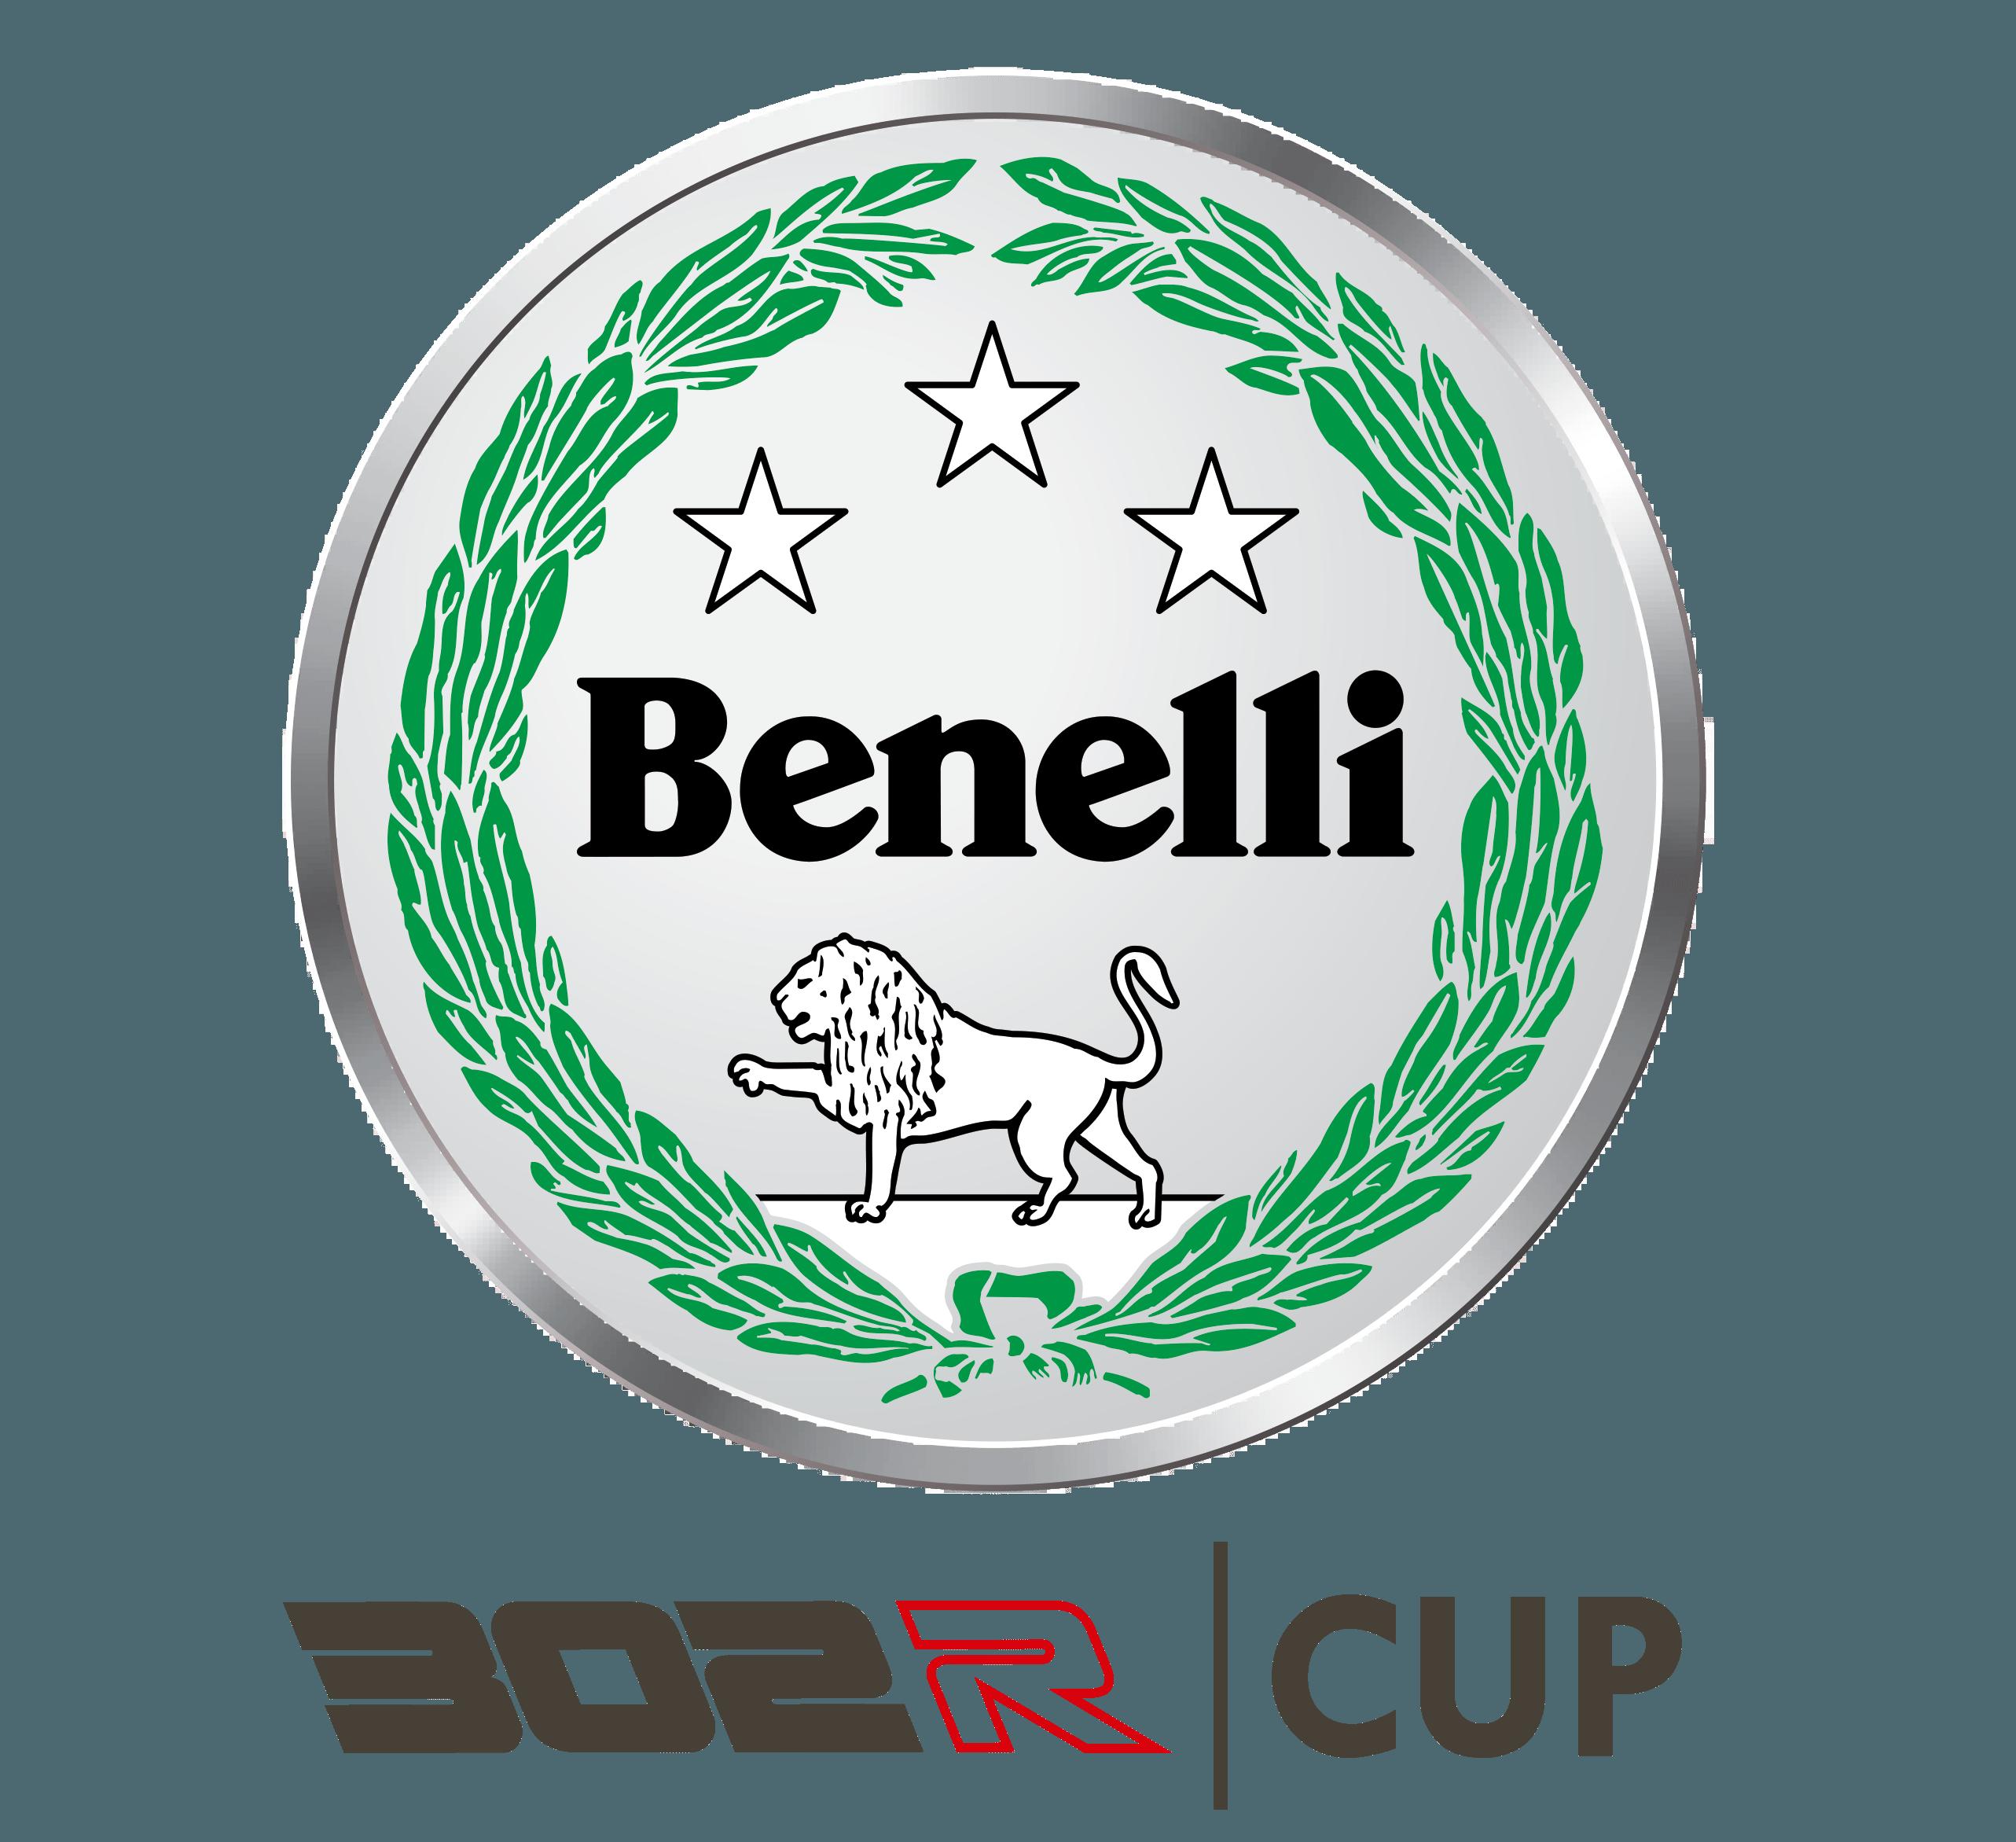 Copa Benelli-Cetelem 2019